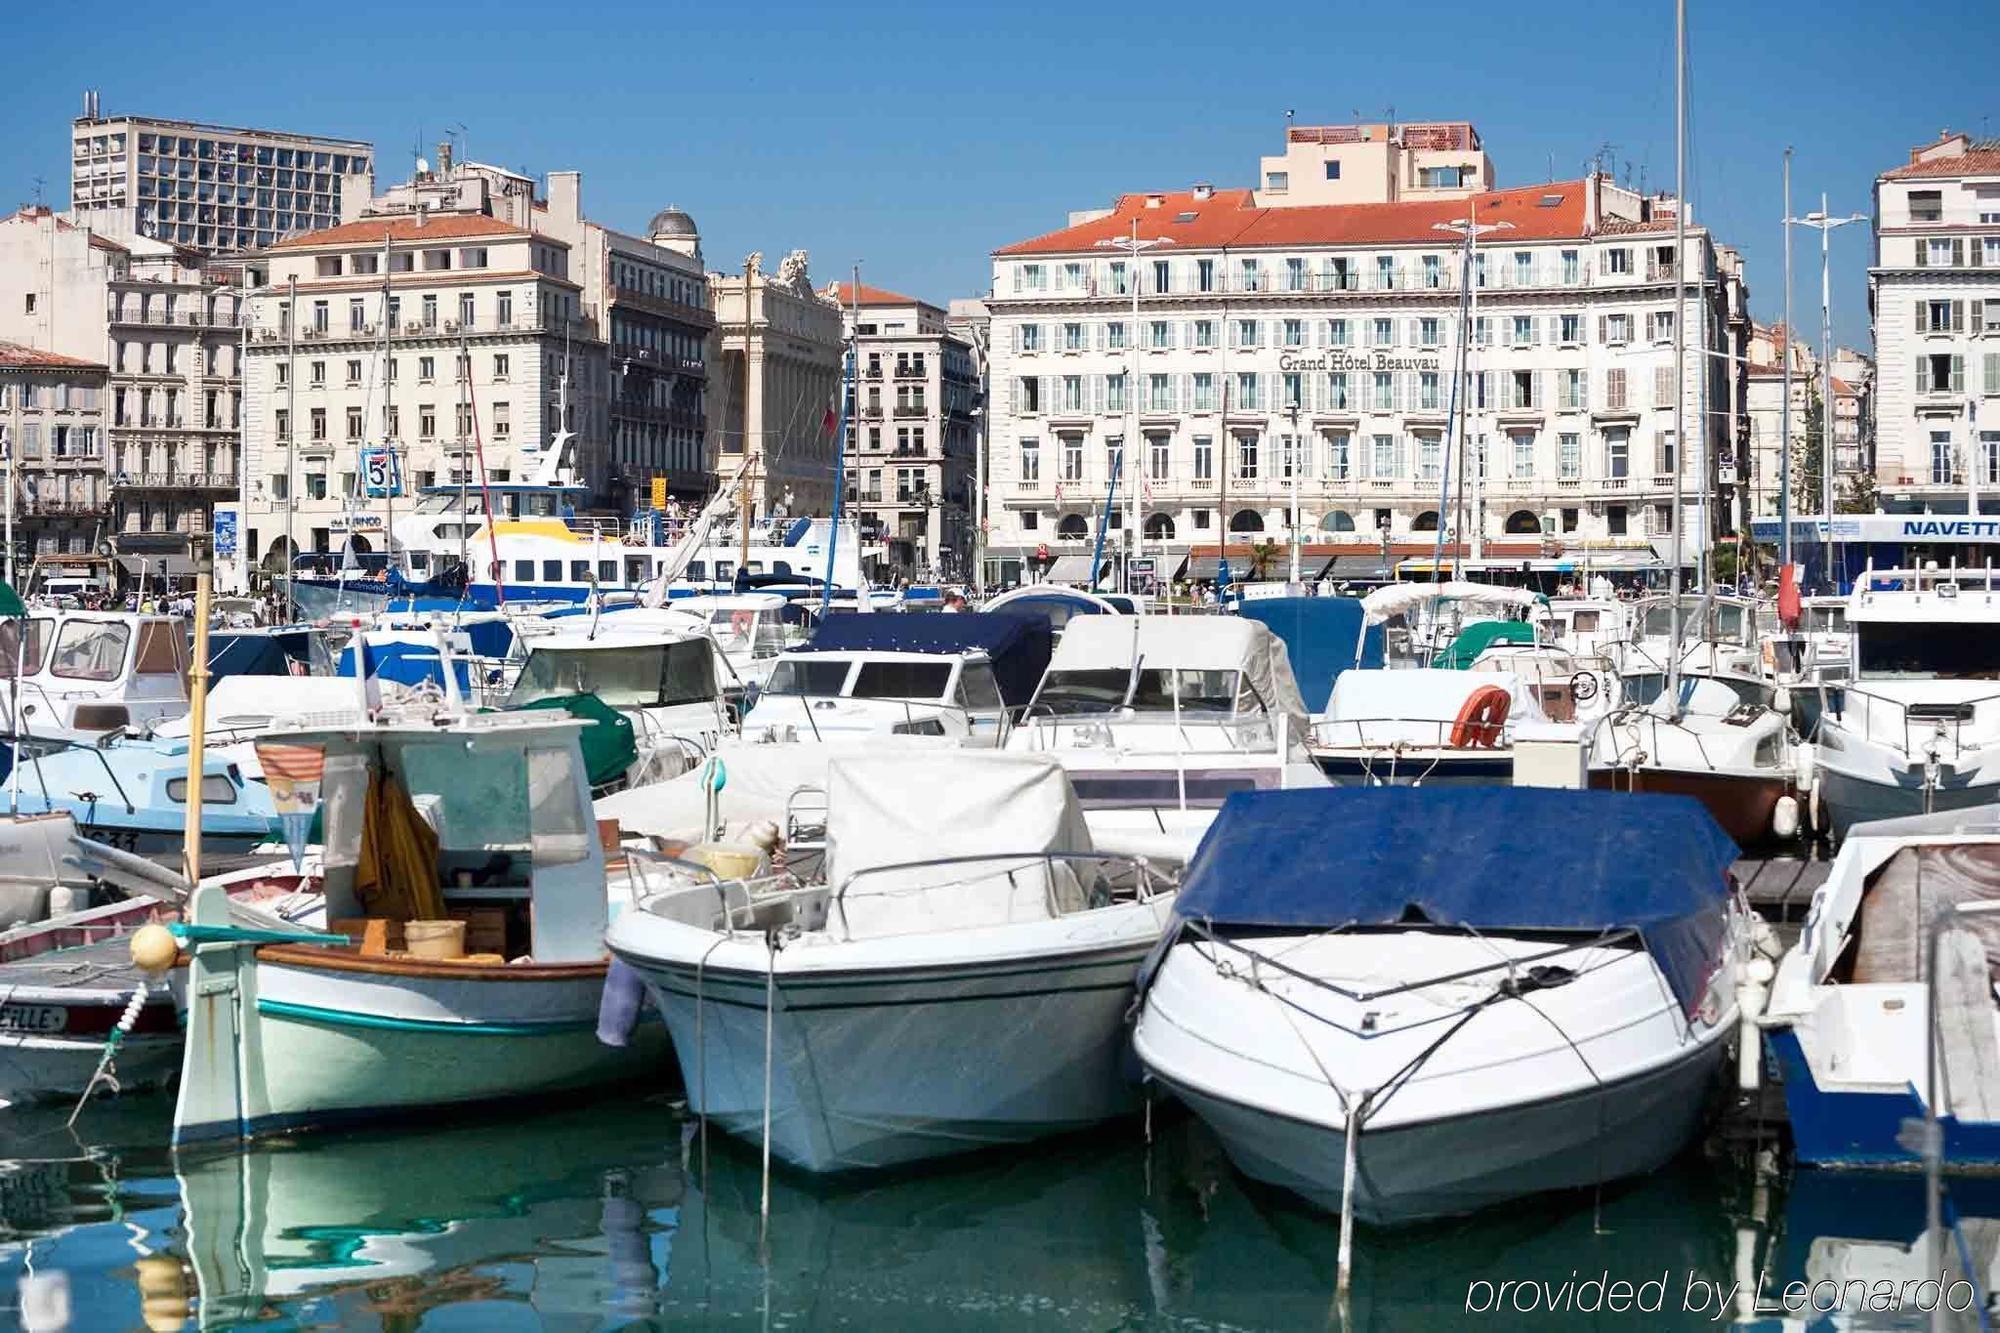 Grand hotel beauvau marseille for Hotels marseille